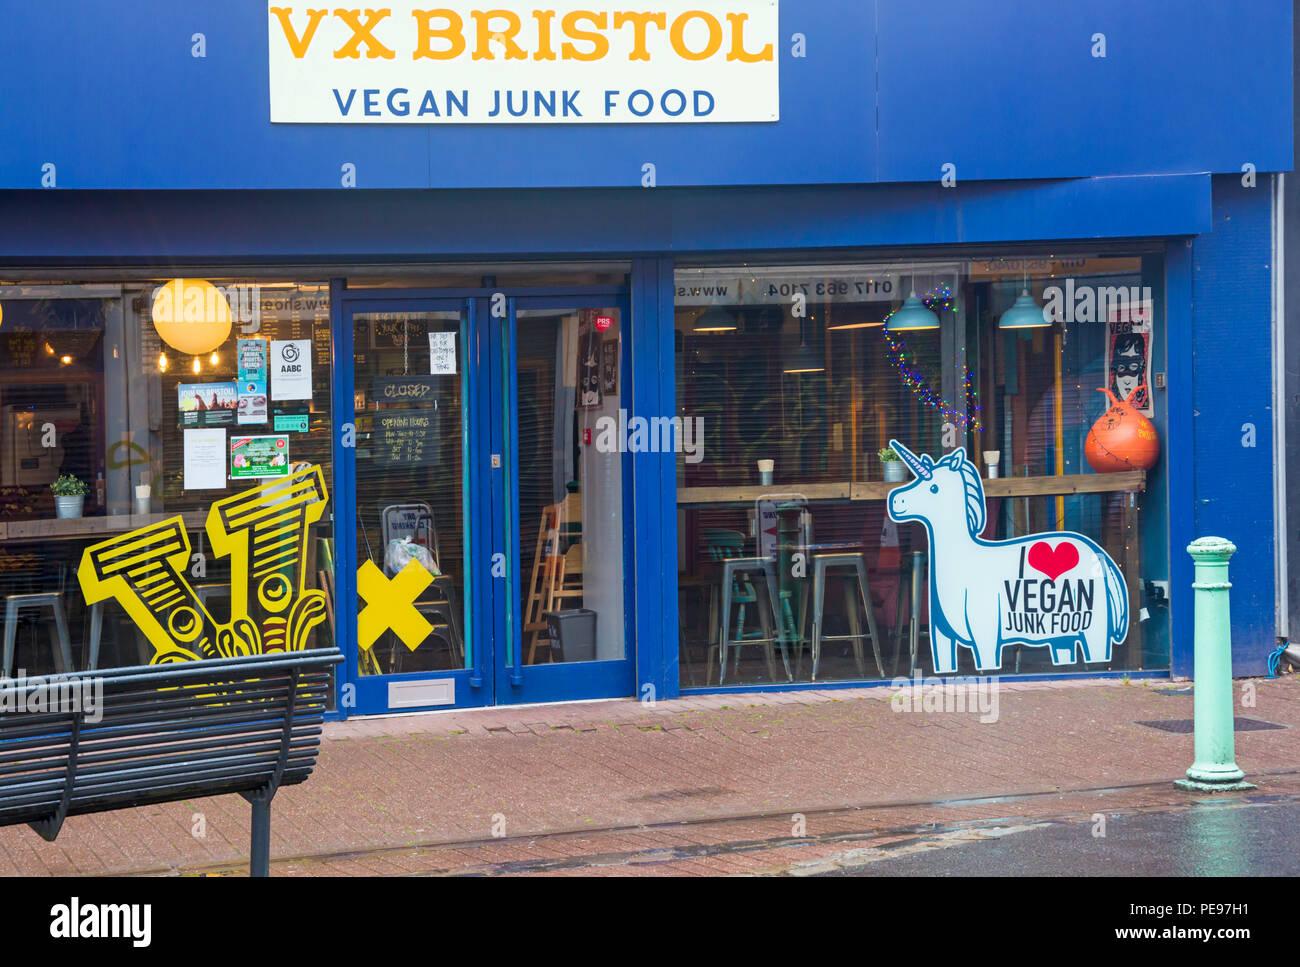 Vx Bristol Vegan Junk Food Coffee Shop And Vegan Grocery